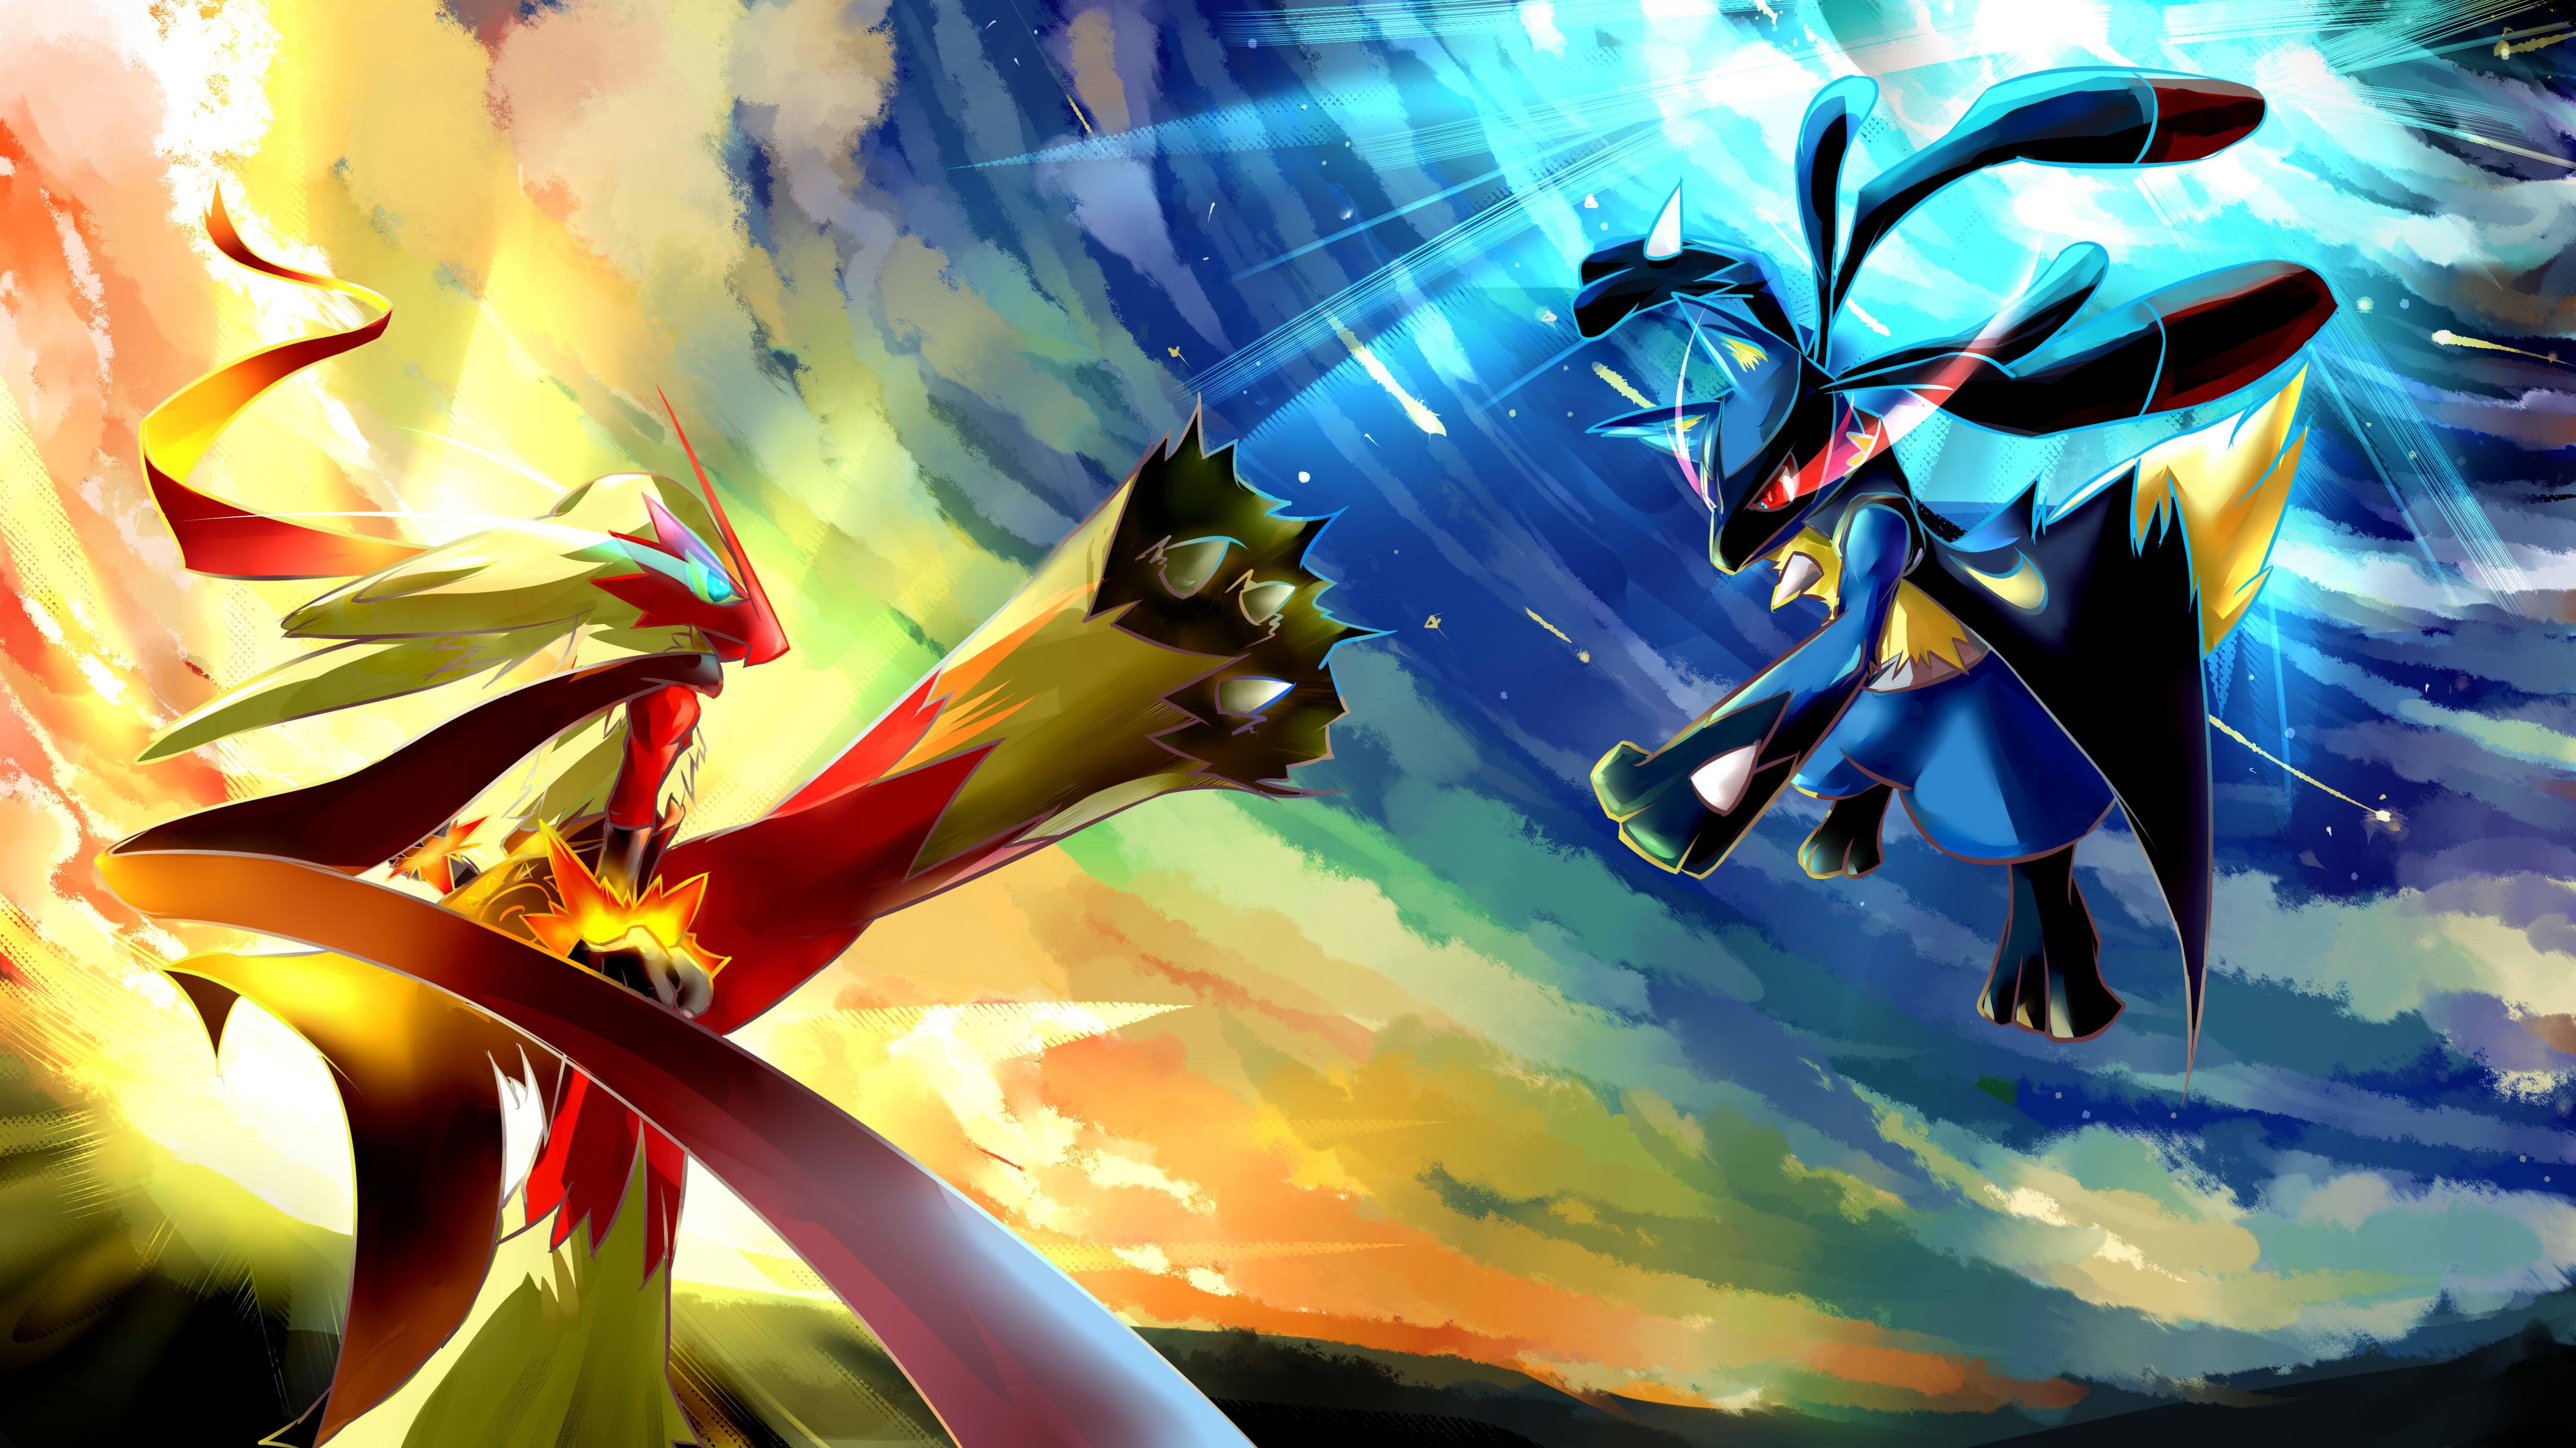 Lucario Vs Brasegali - Pokemon Wallpaper Hd , HD Wallpaper & Backgrounds